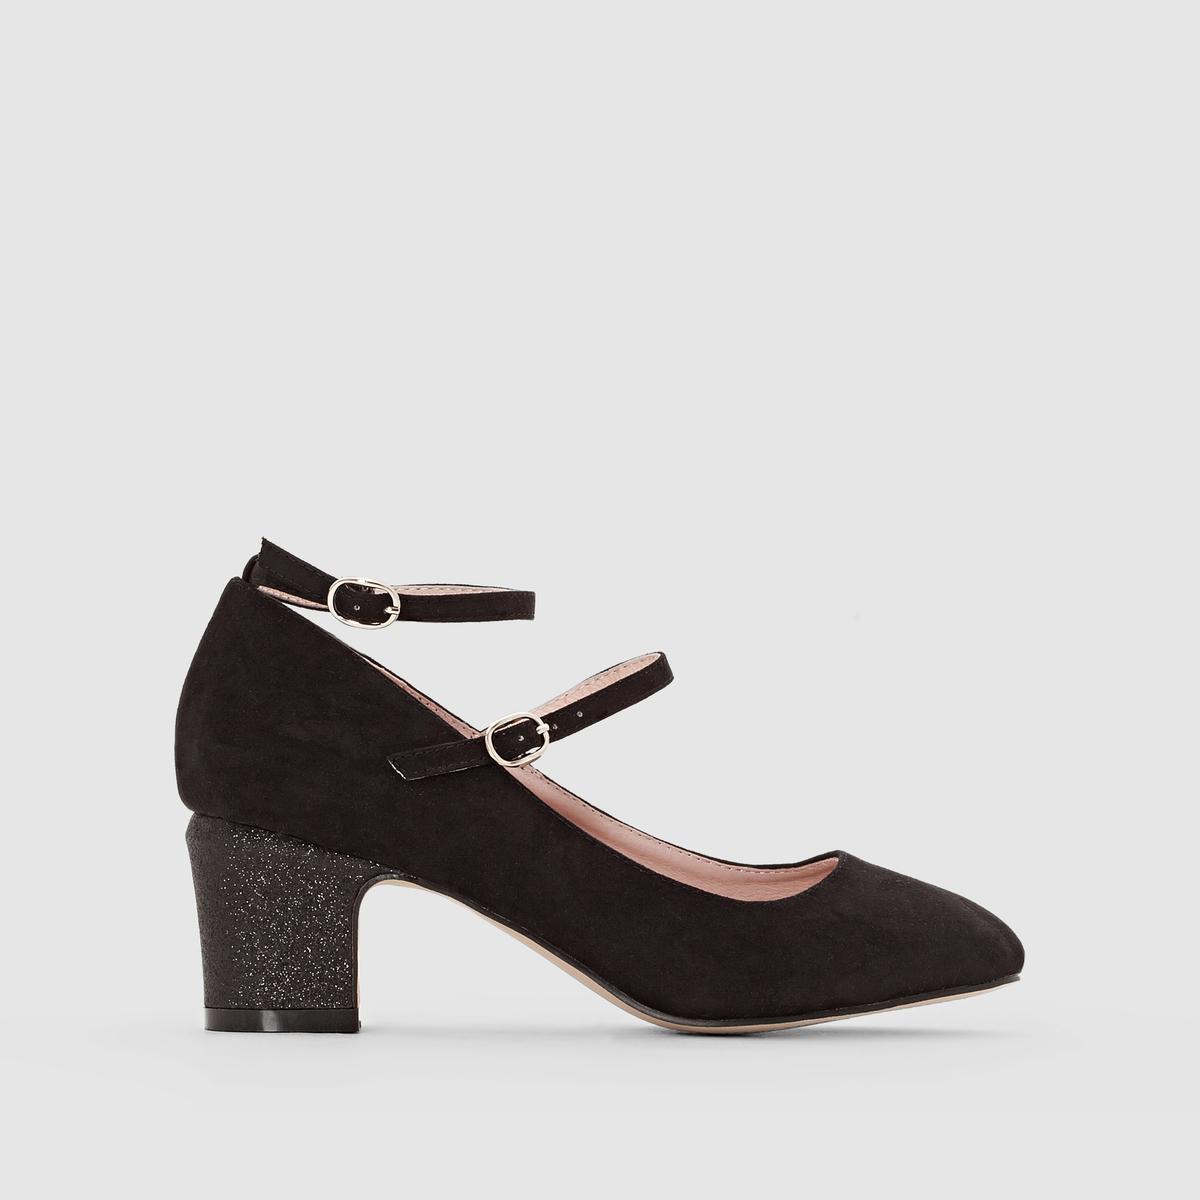 Босоножки с блестками на каблуке с двойным ремешком от MADEMOISELLE R